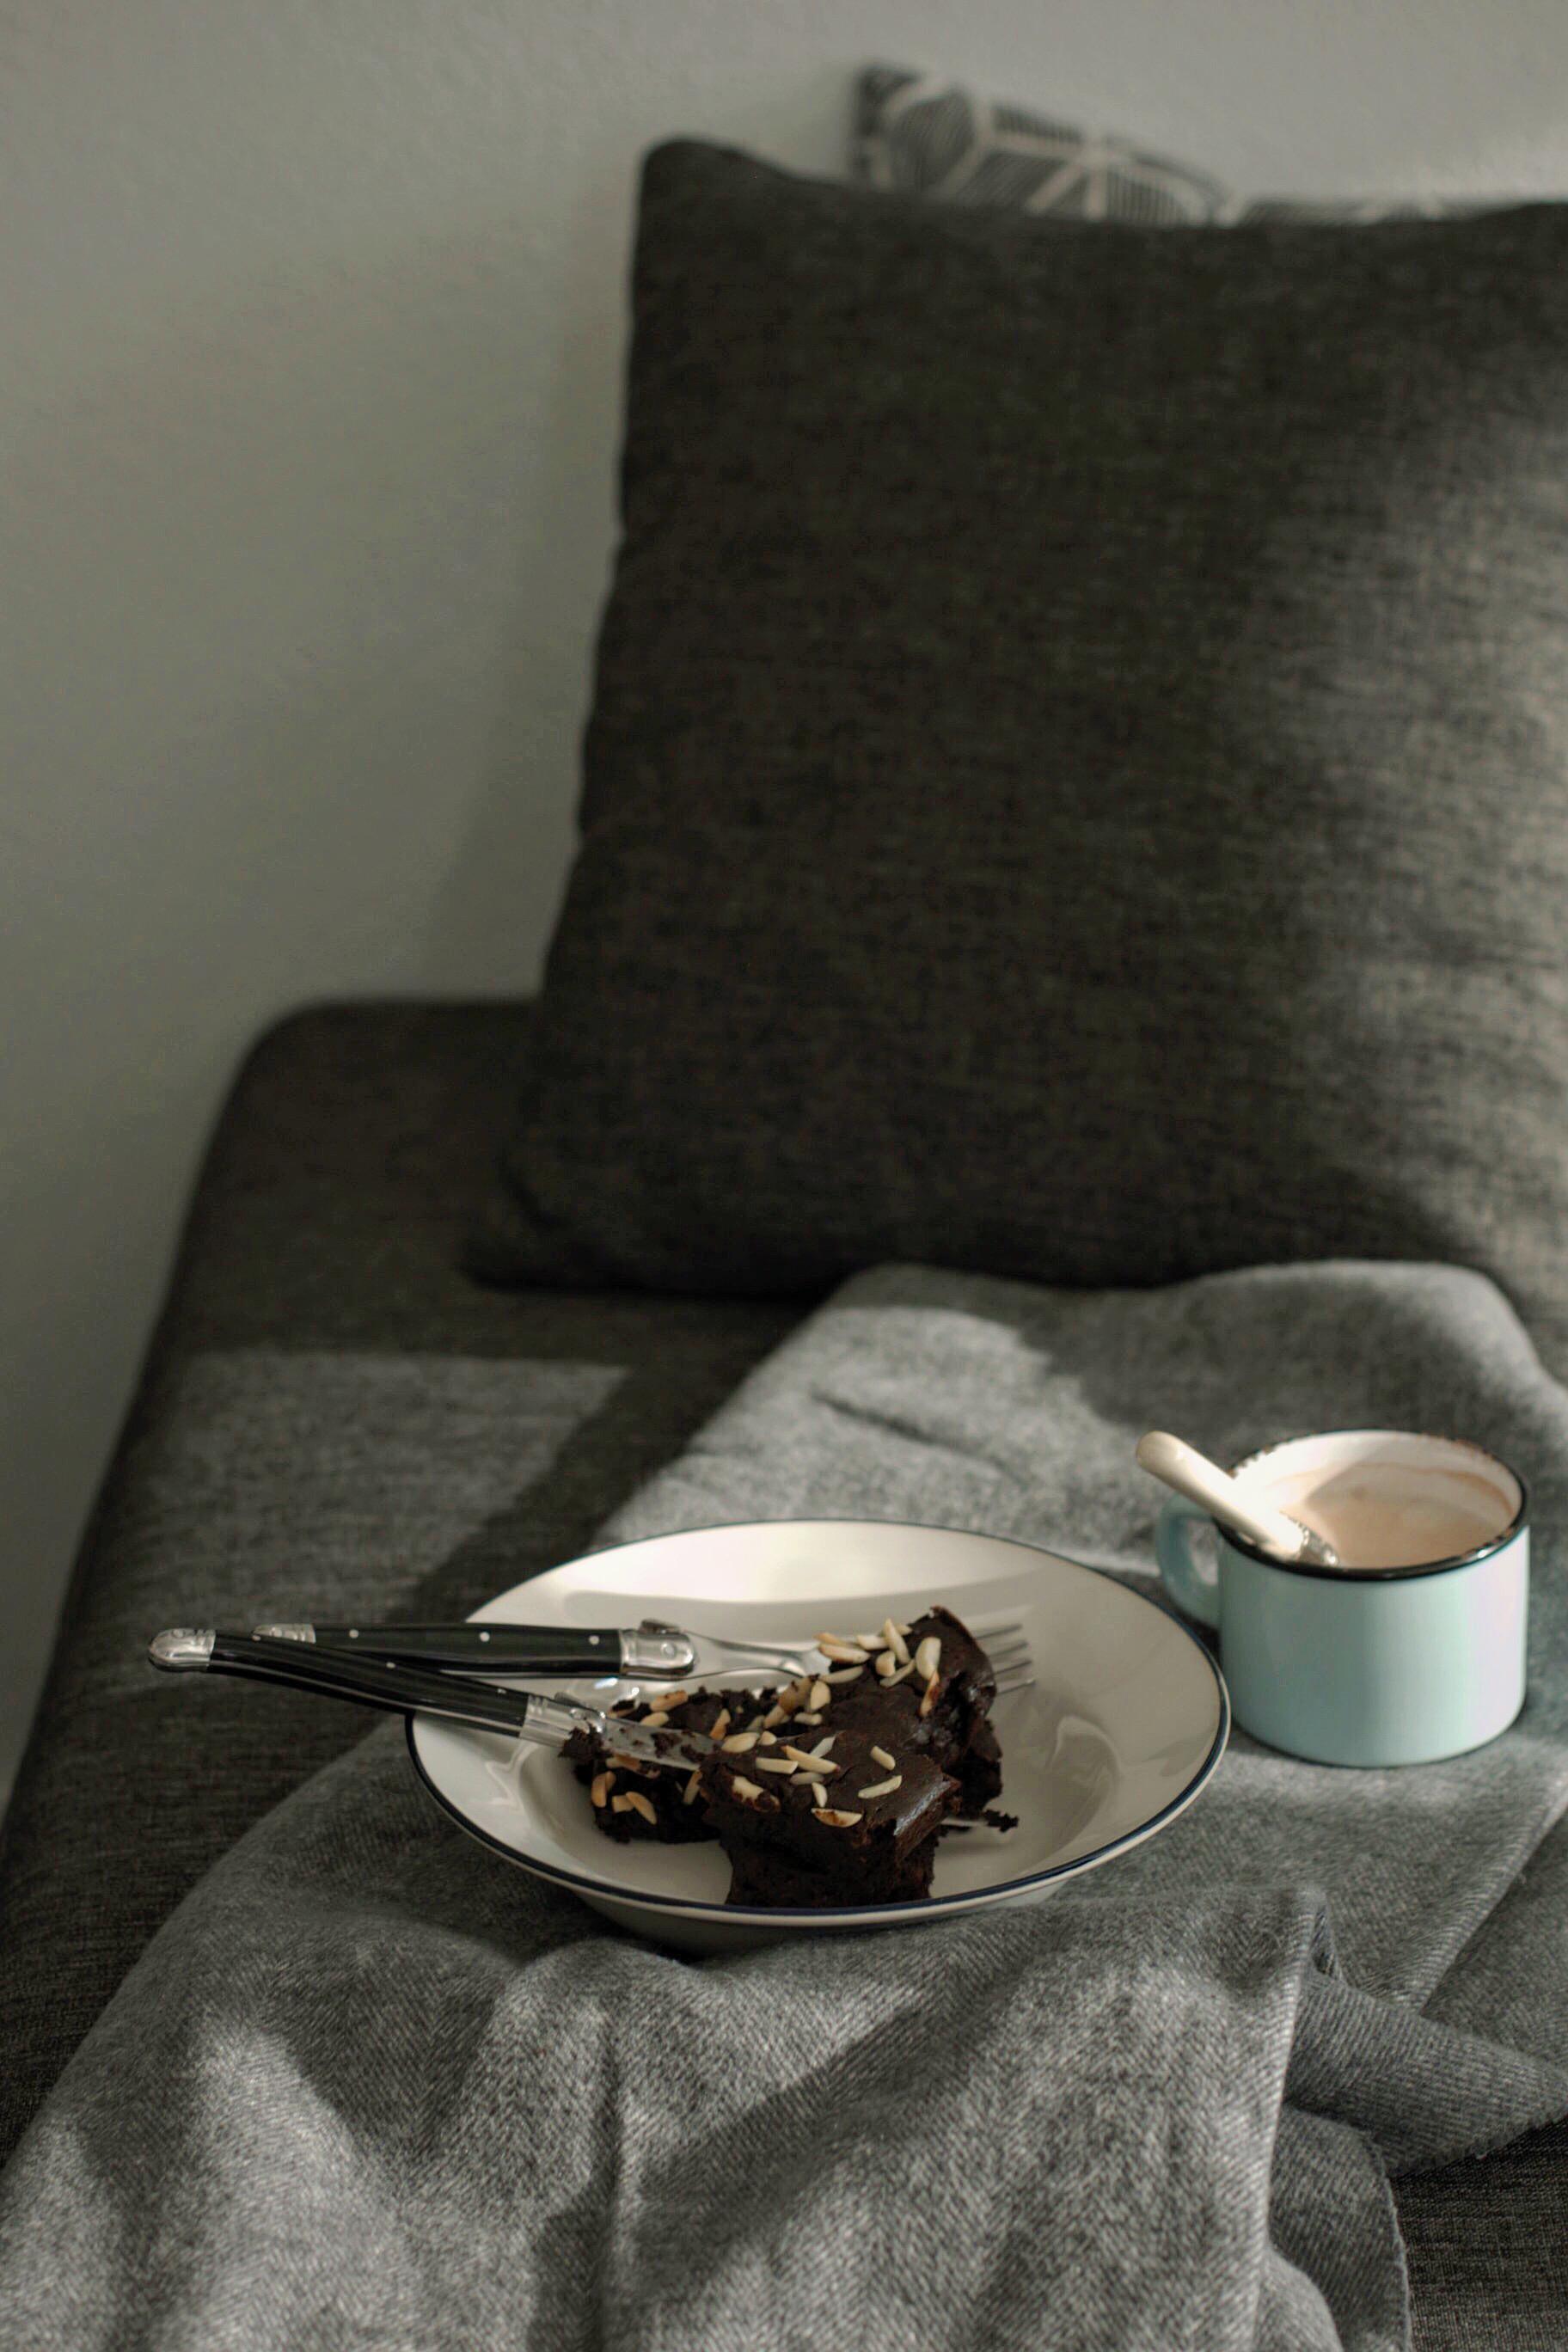 SHAREAT-Avocado Brownies